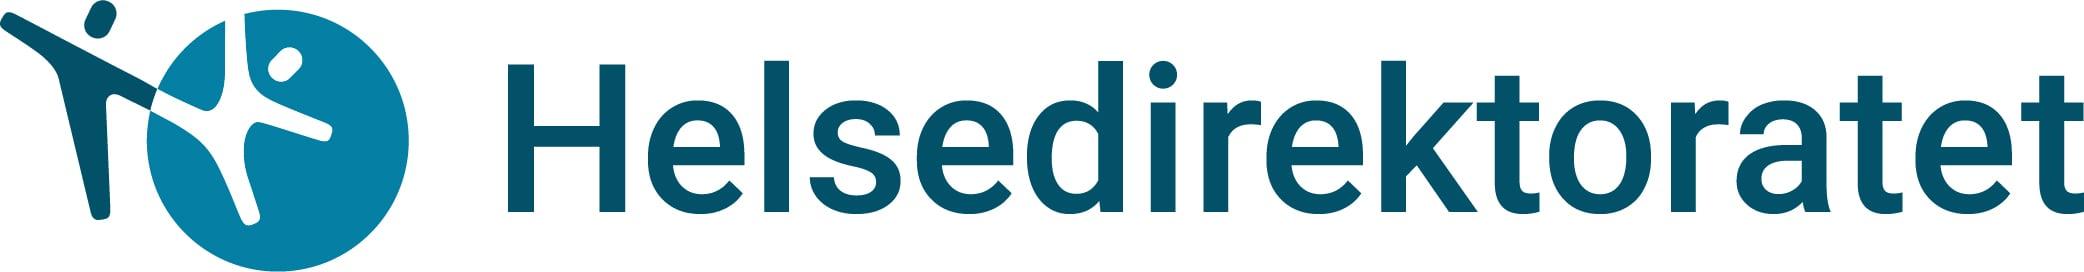 Hdir logo-1